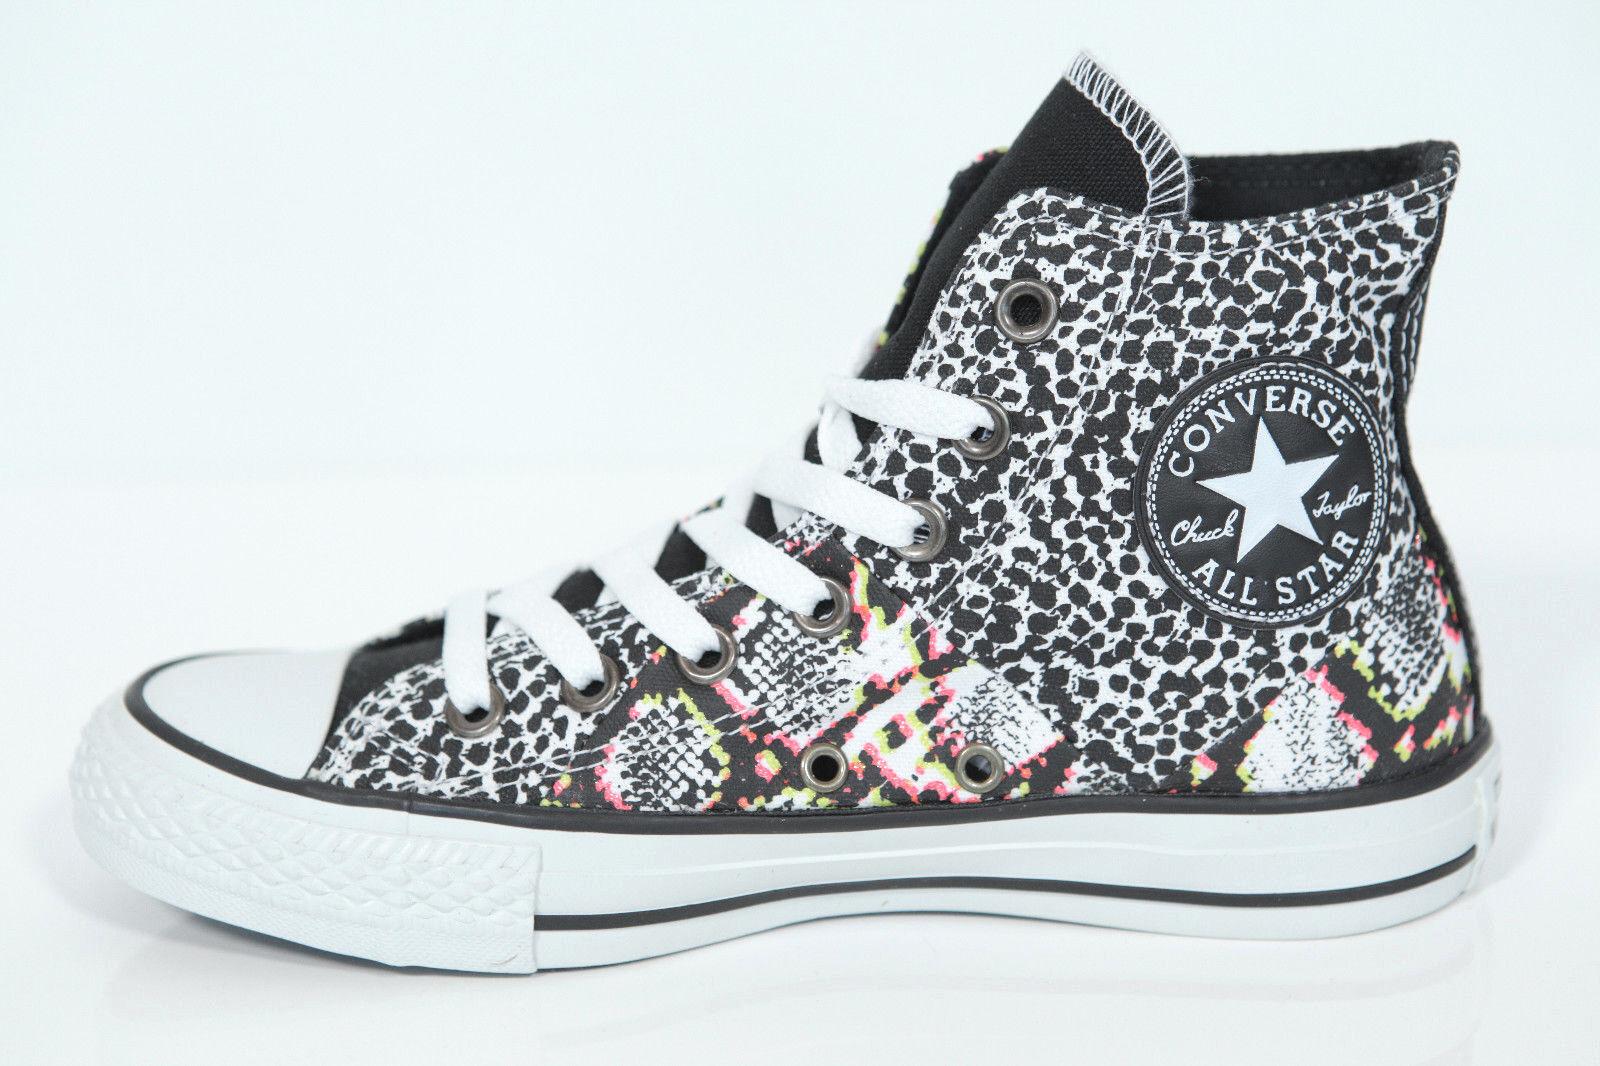 Neu All Star Converse Chucks hi Sneaker Schuhe Multi Panel 542491c Retro